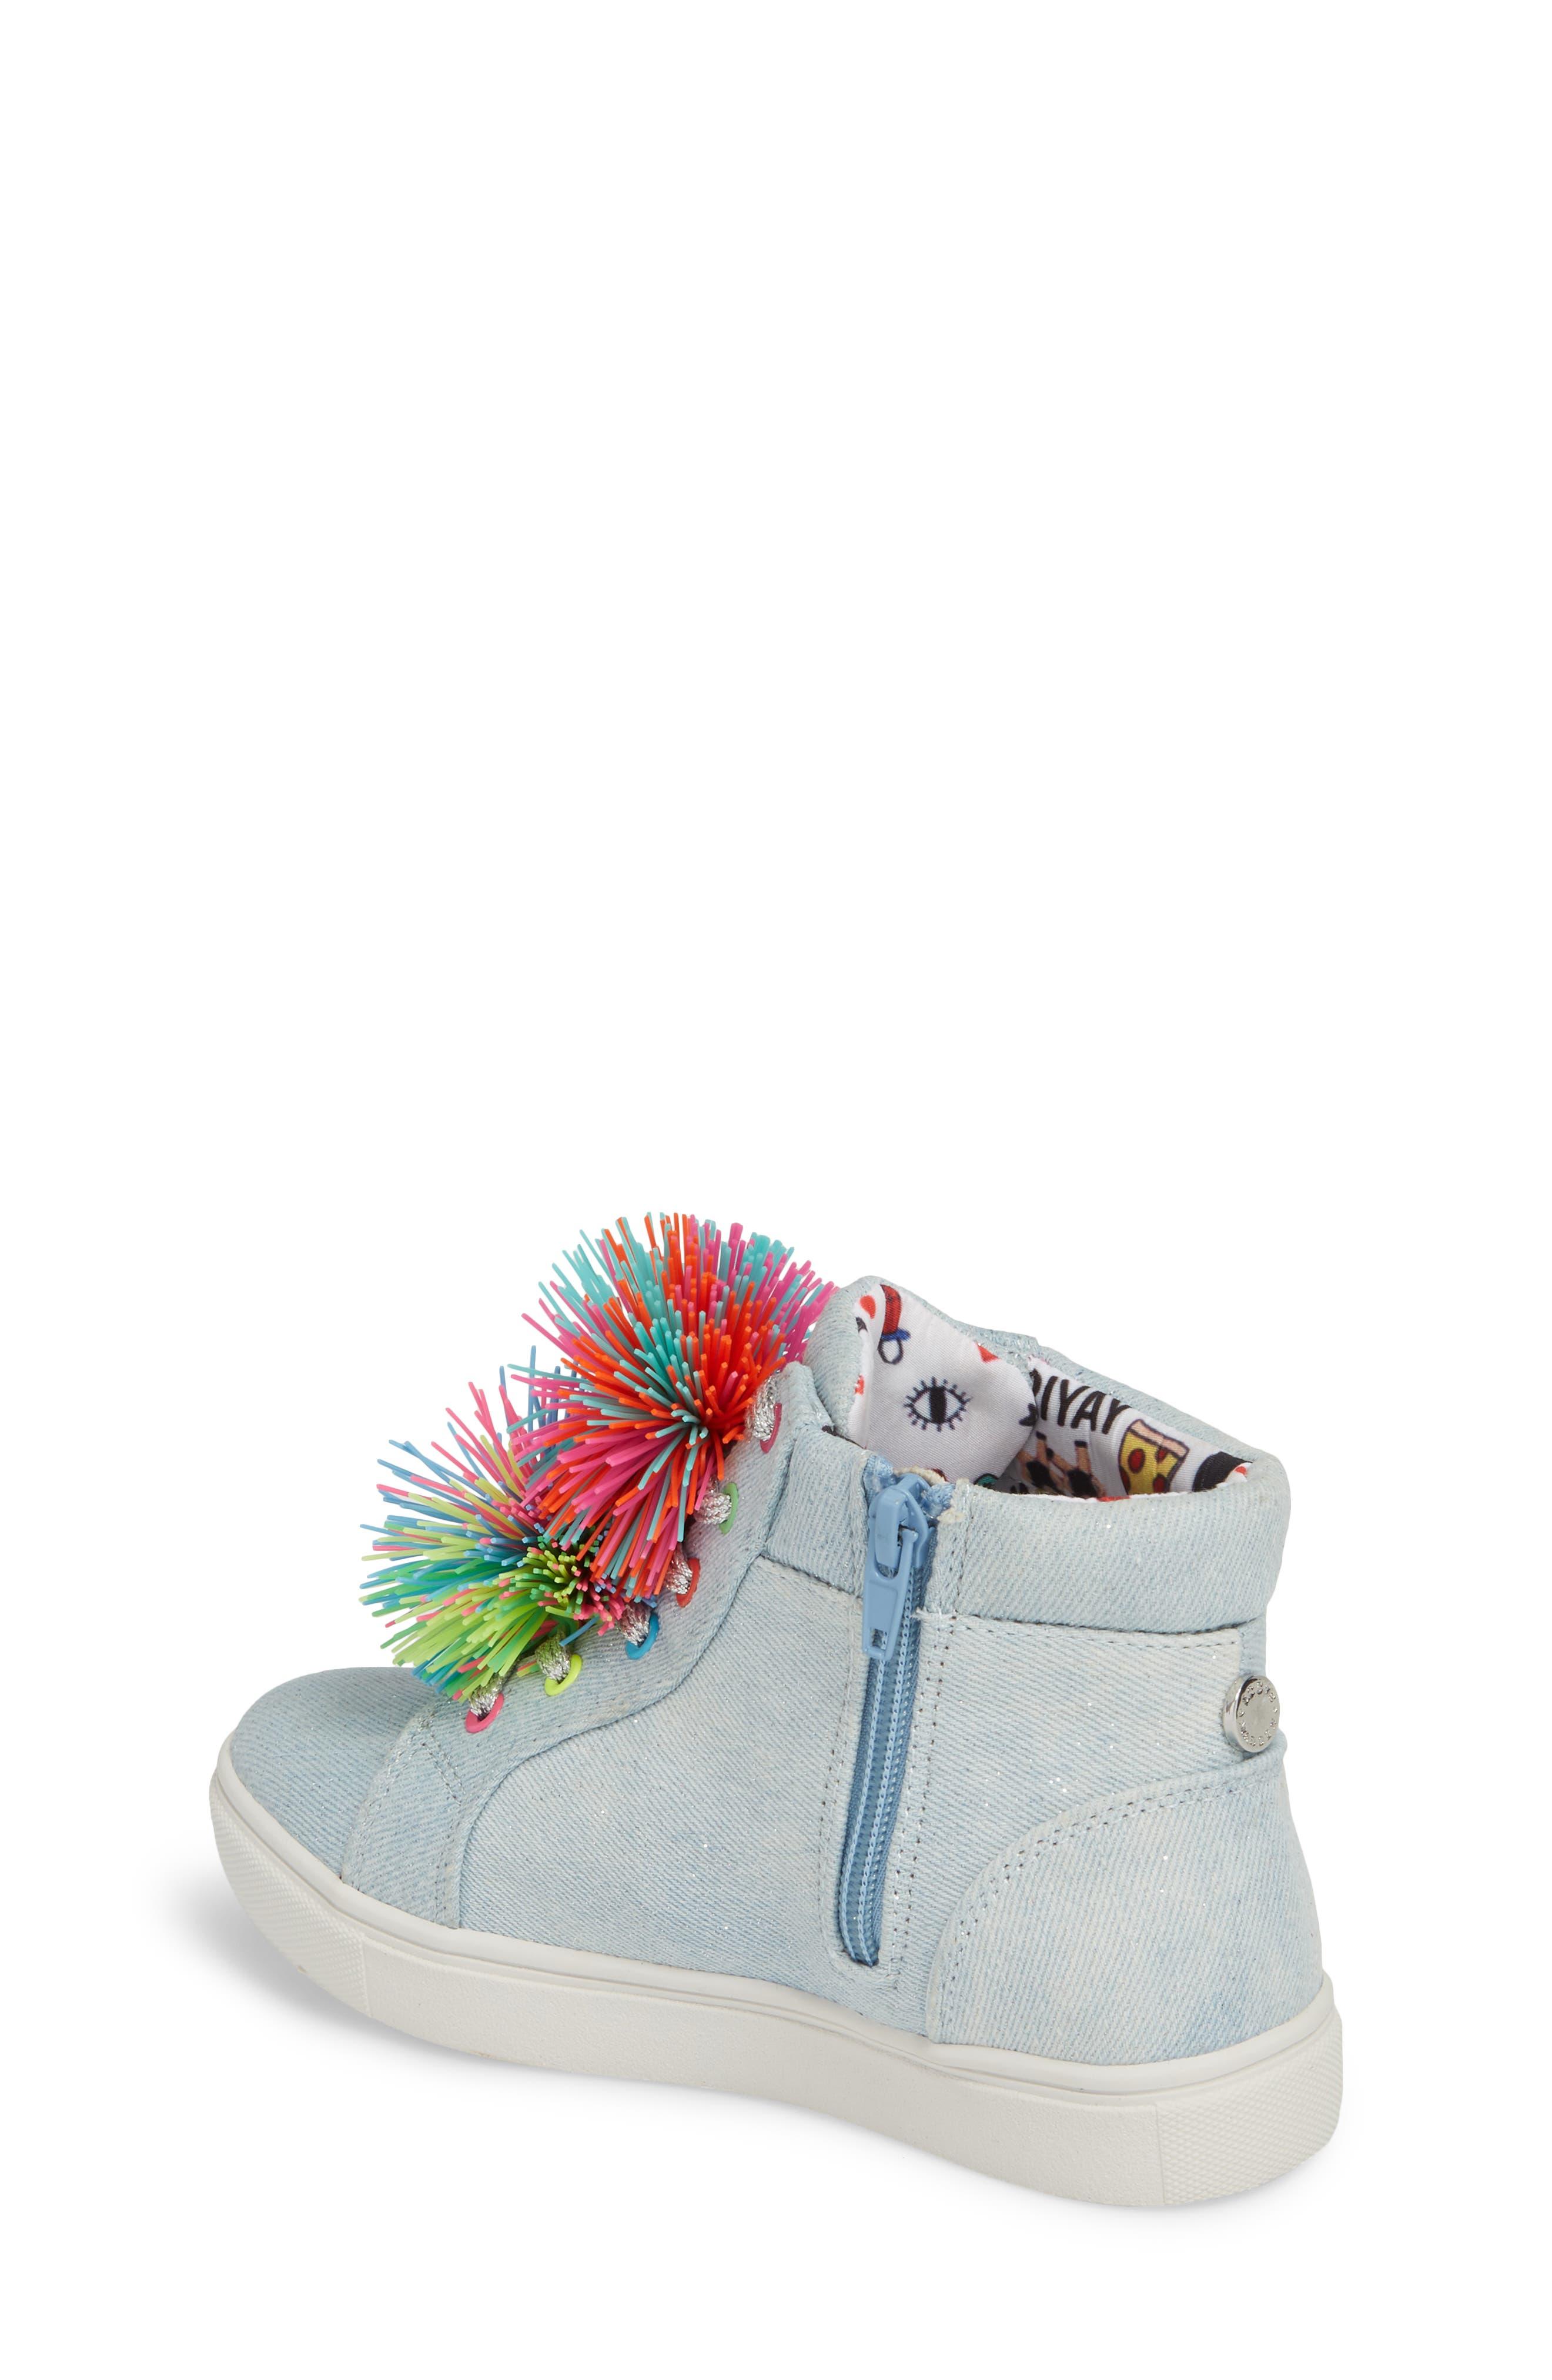 JBrendie Pompom High Top Sneaker,                             Alternate thumbnail 2, color,                             401